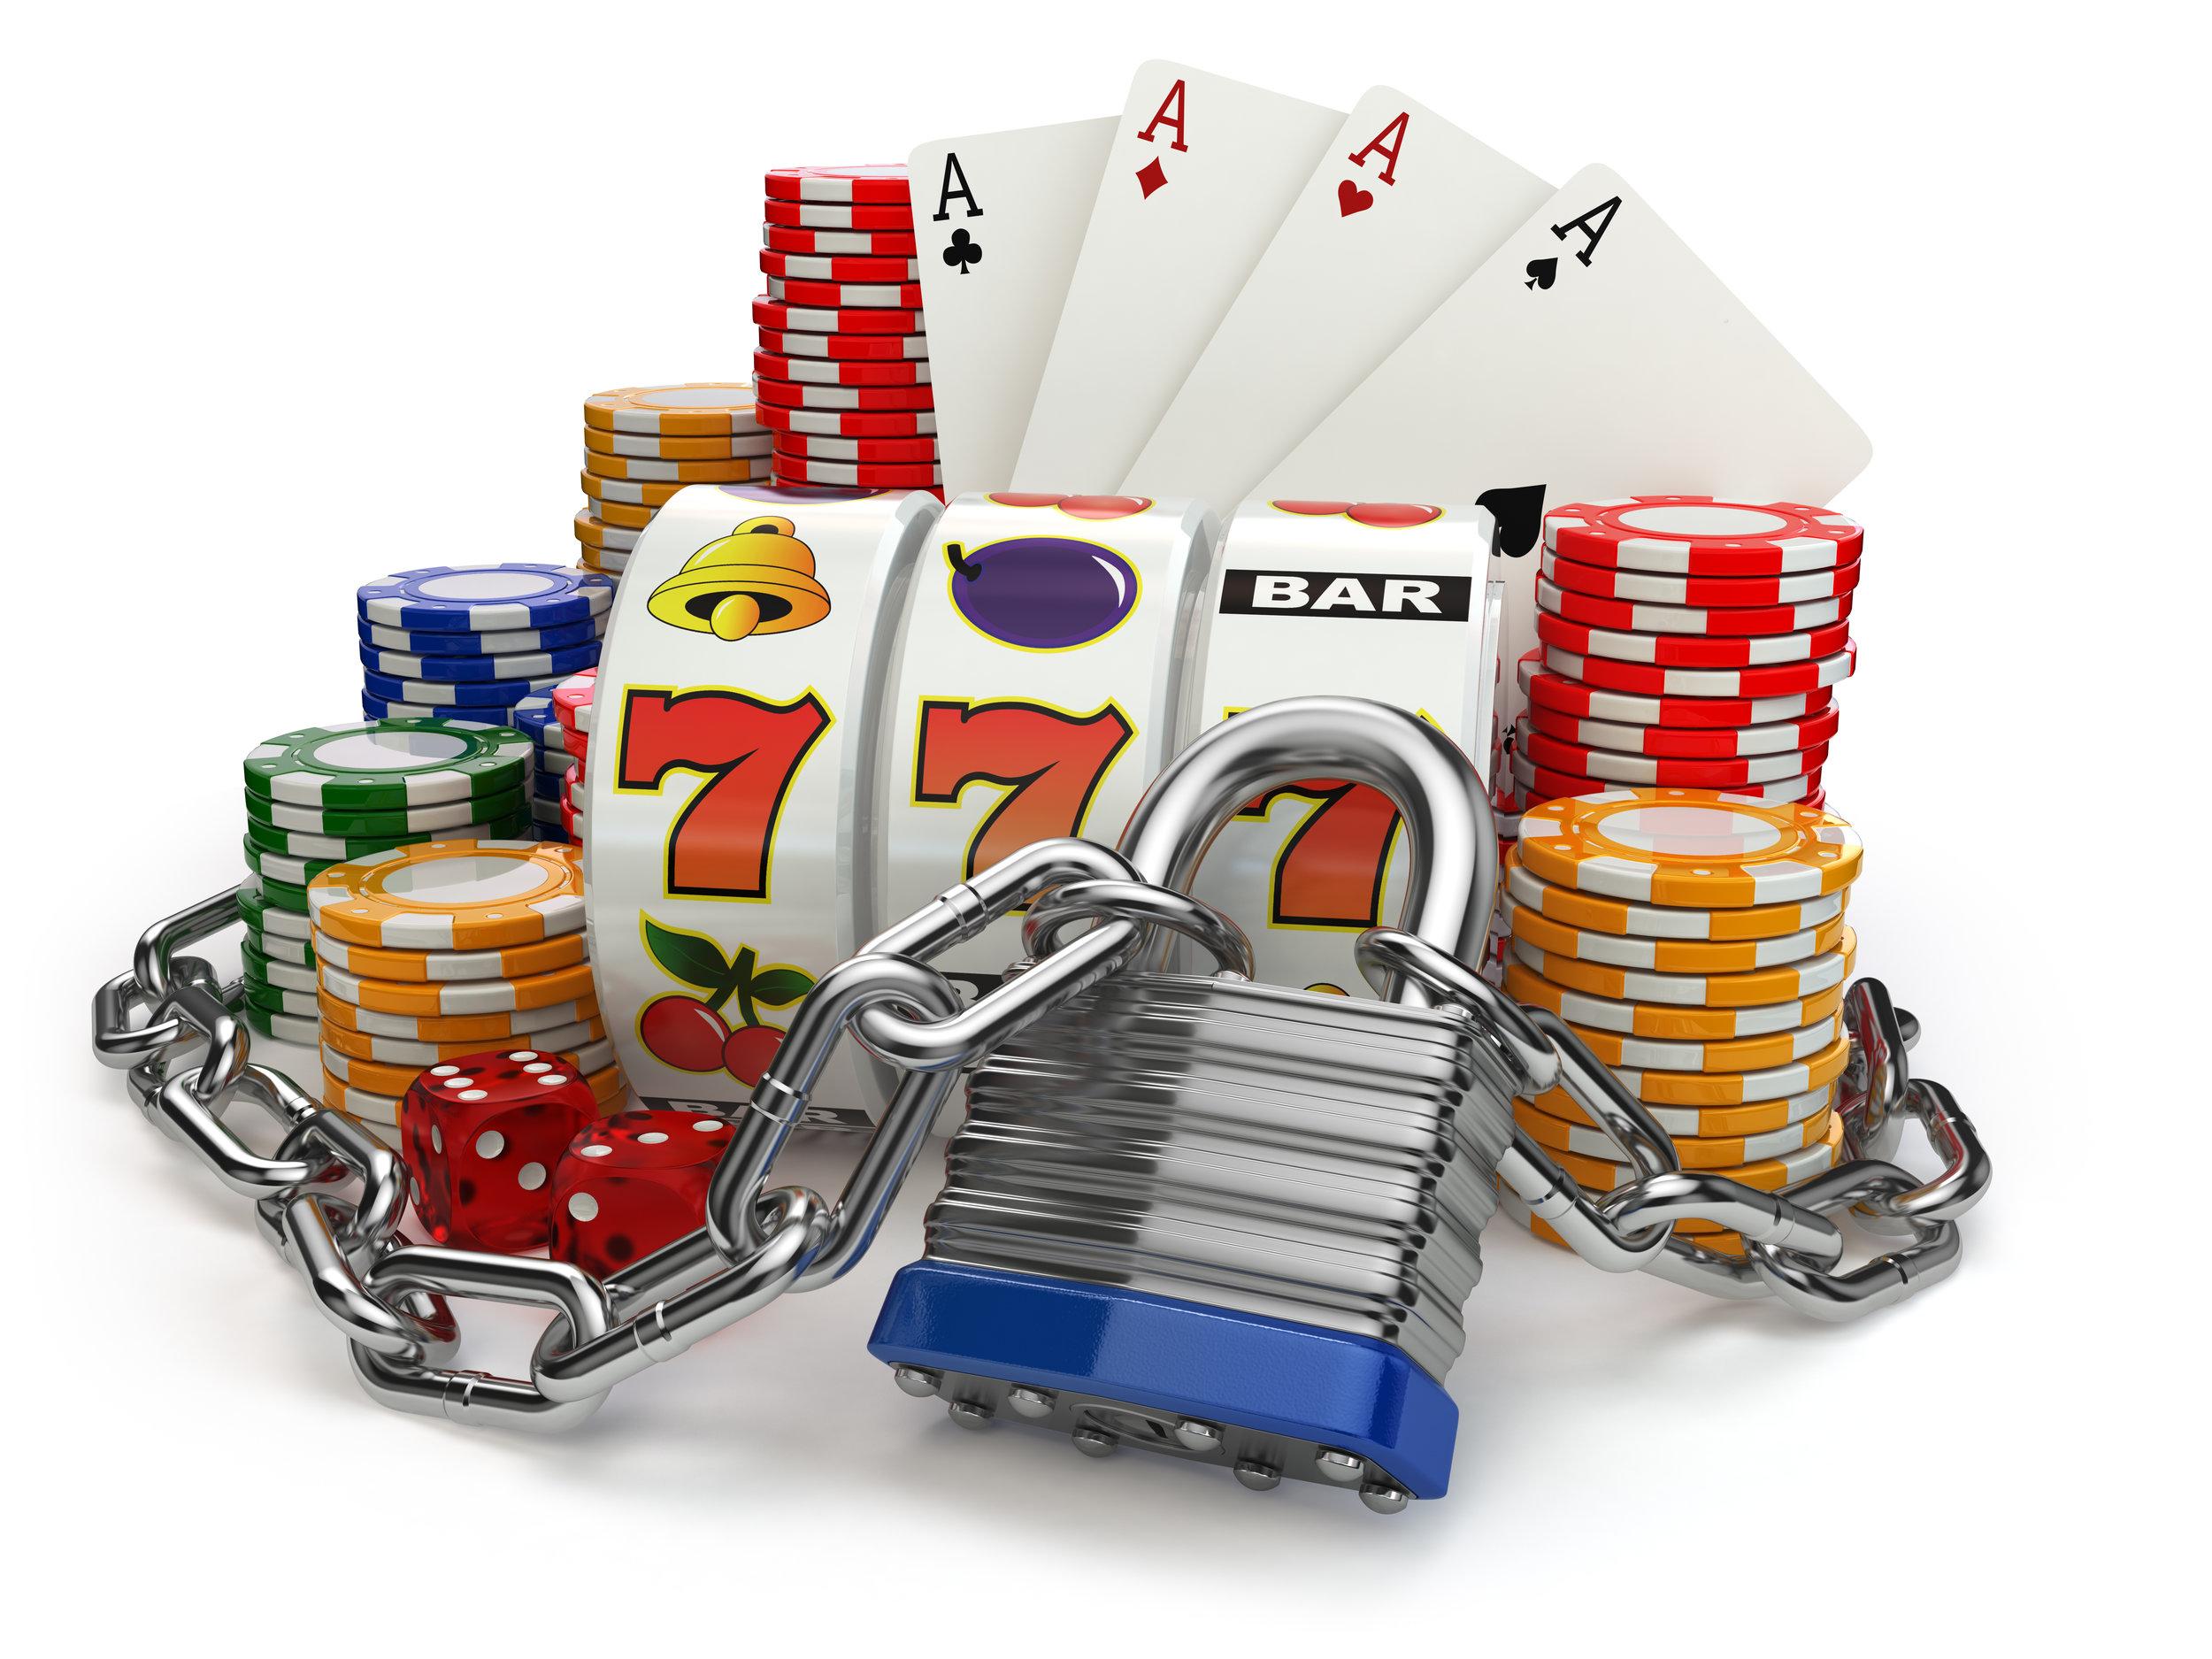 bigstock-Gambling-addiction-concept-Sl-189697612.jpg